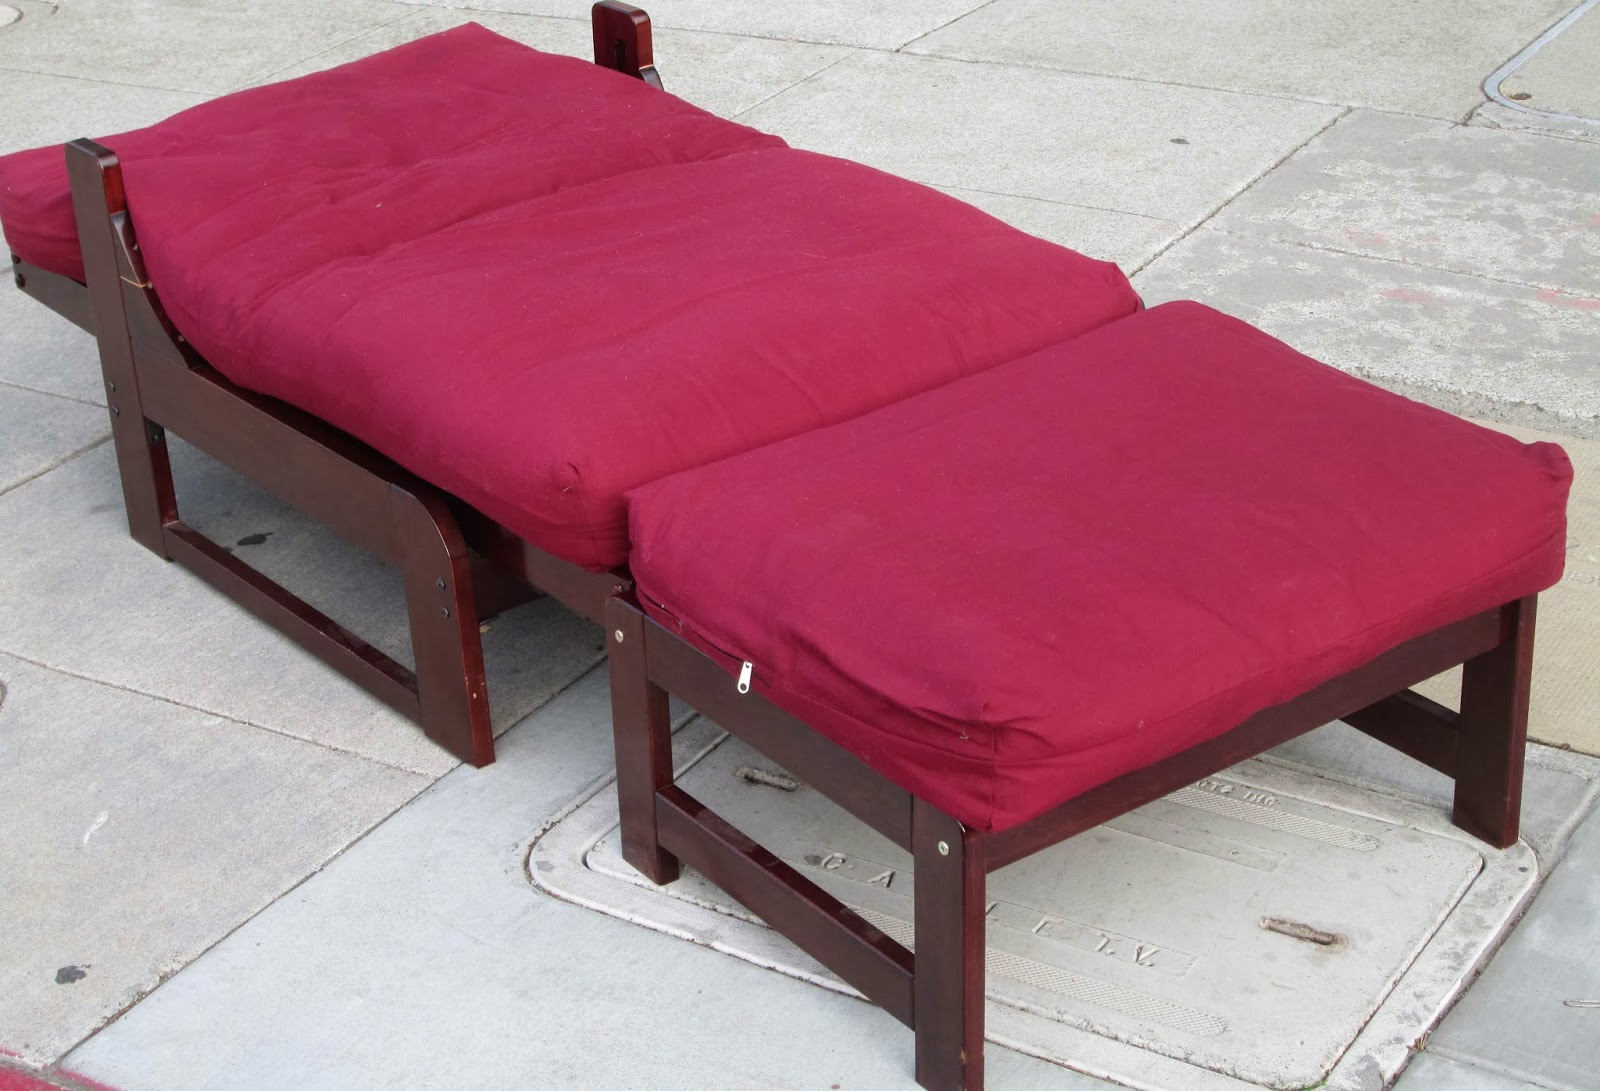 sold red single futon chair ottoman cushions    70 uhuru furniture  u0026 collectibles  sold red single futon chair      rh   uhurufurniture blogspot